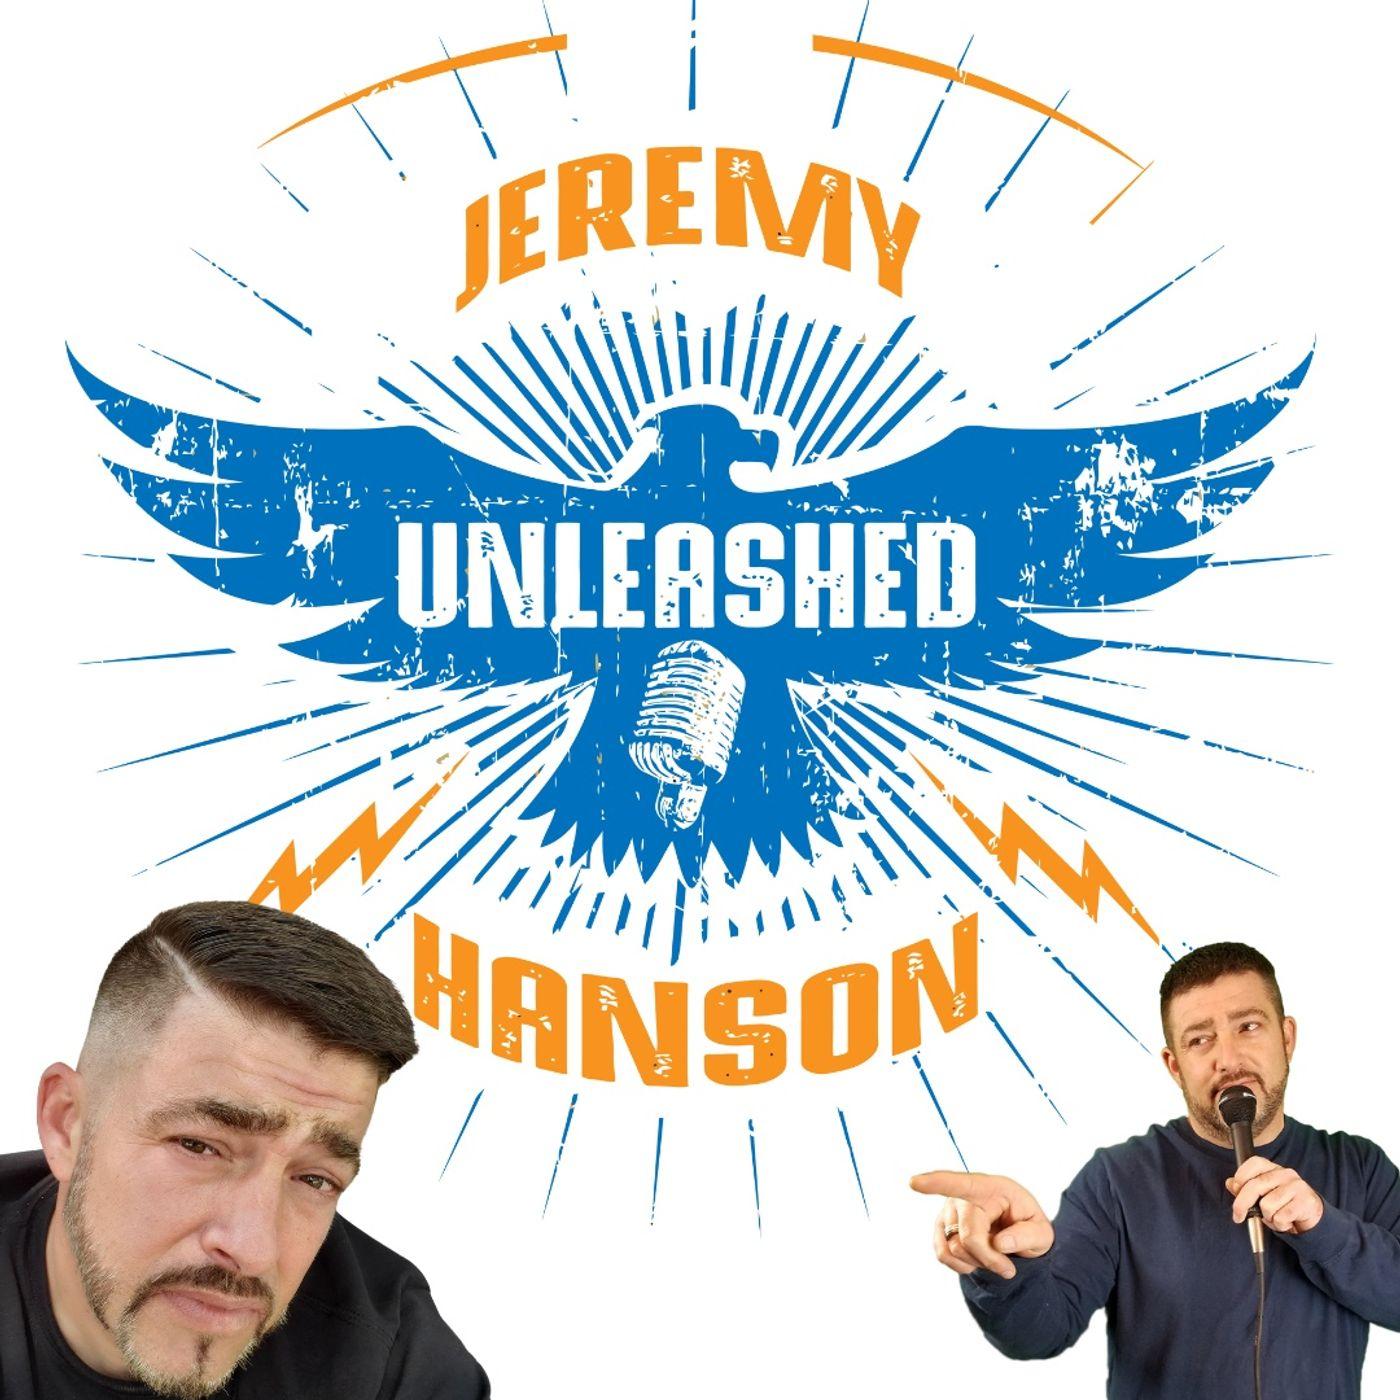 Unleashed Jeremy Hanson revitalized 5 11 21